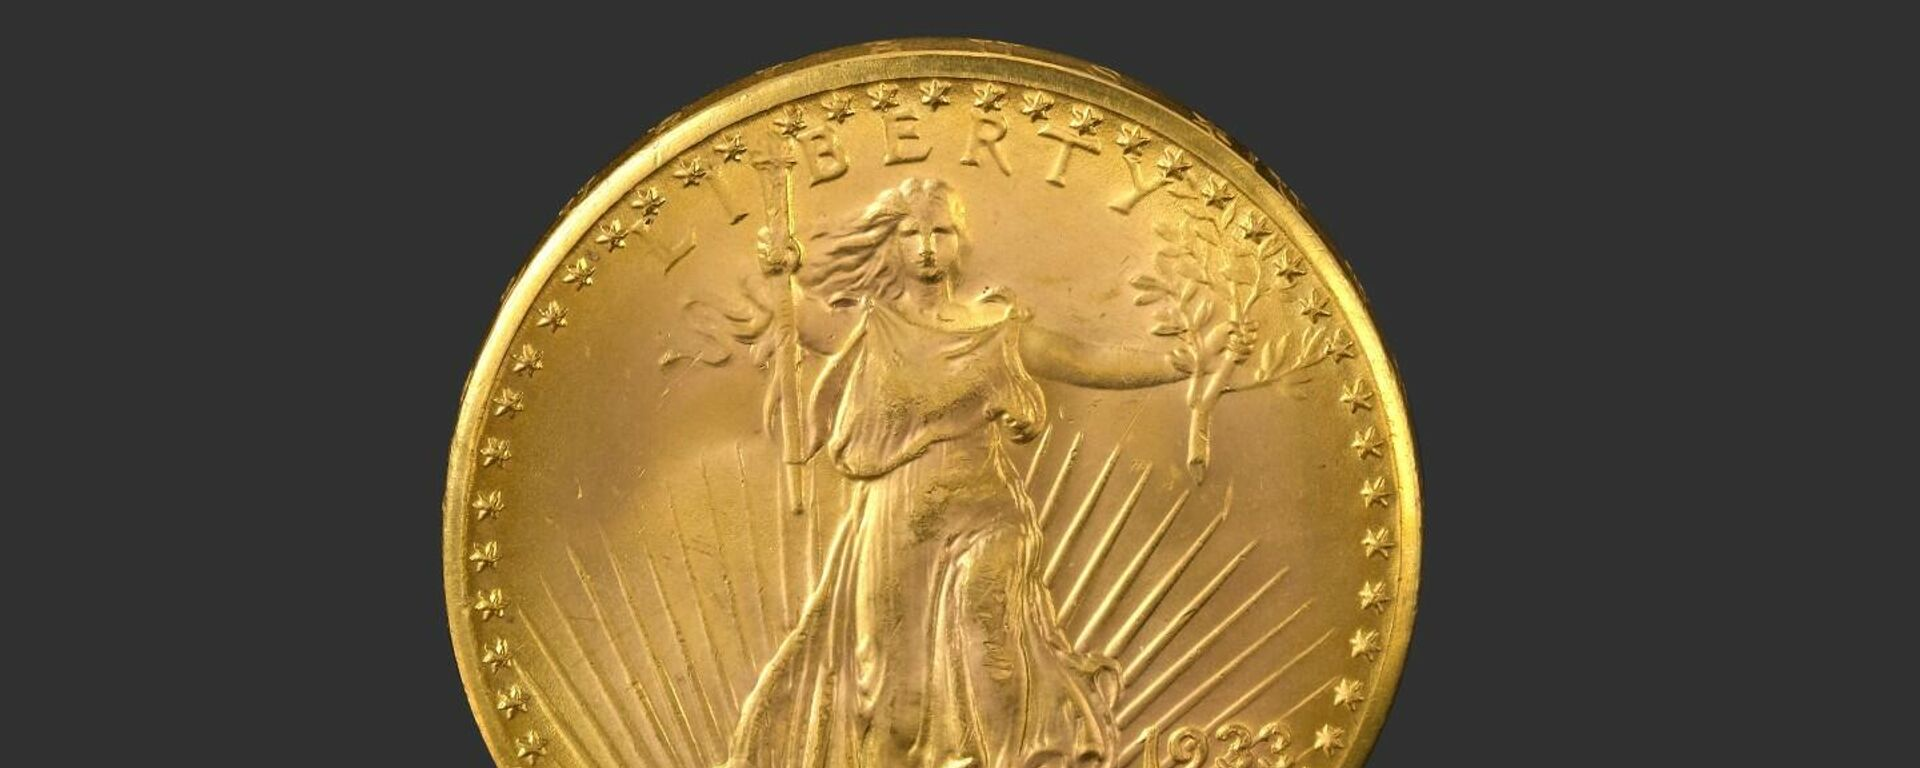 La moneda Águila Doble - Sputnik Mundo, 1920, 09.06.2021